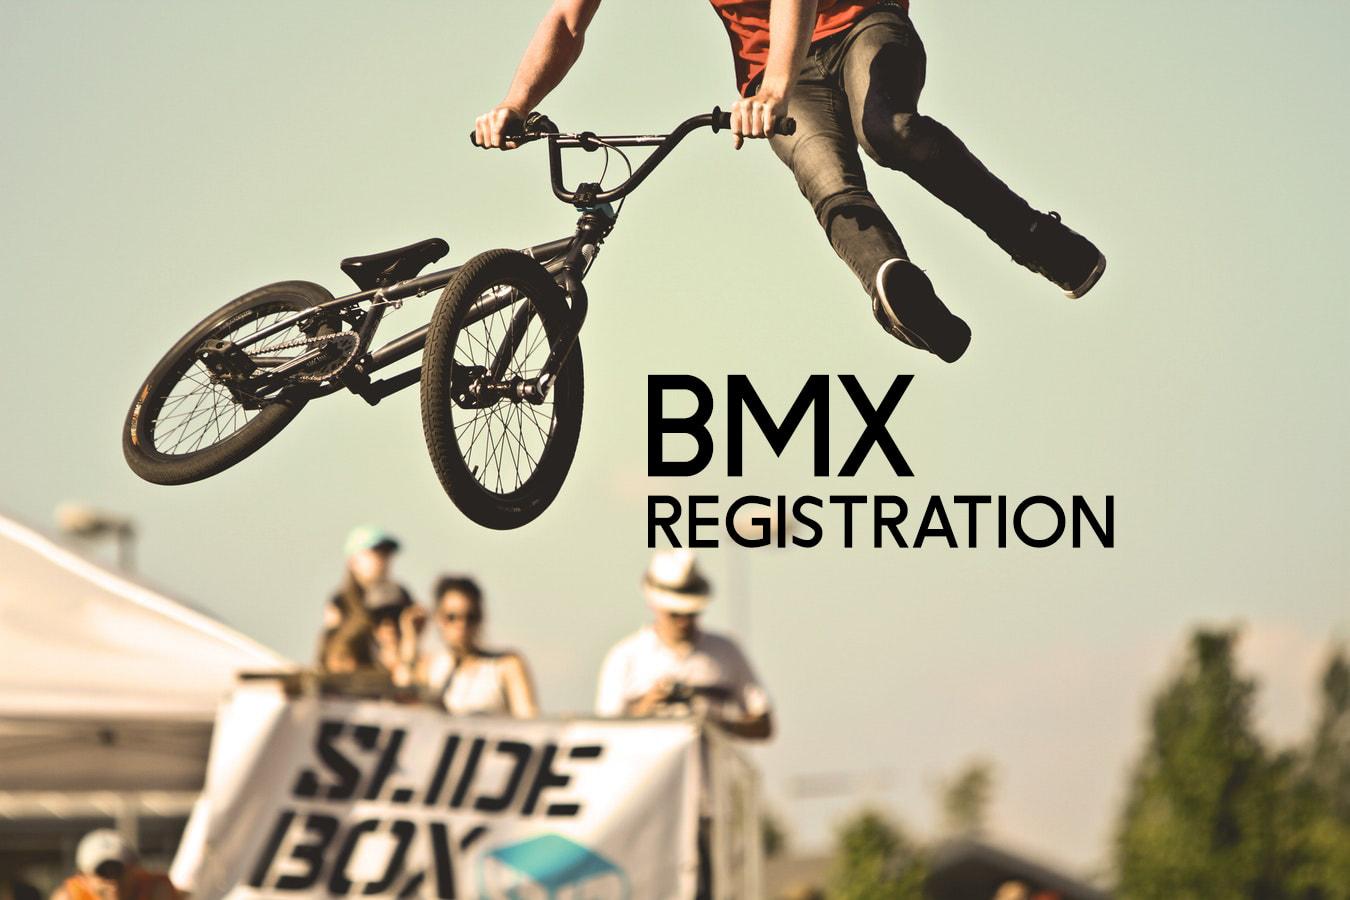 BMX Registration